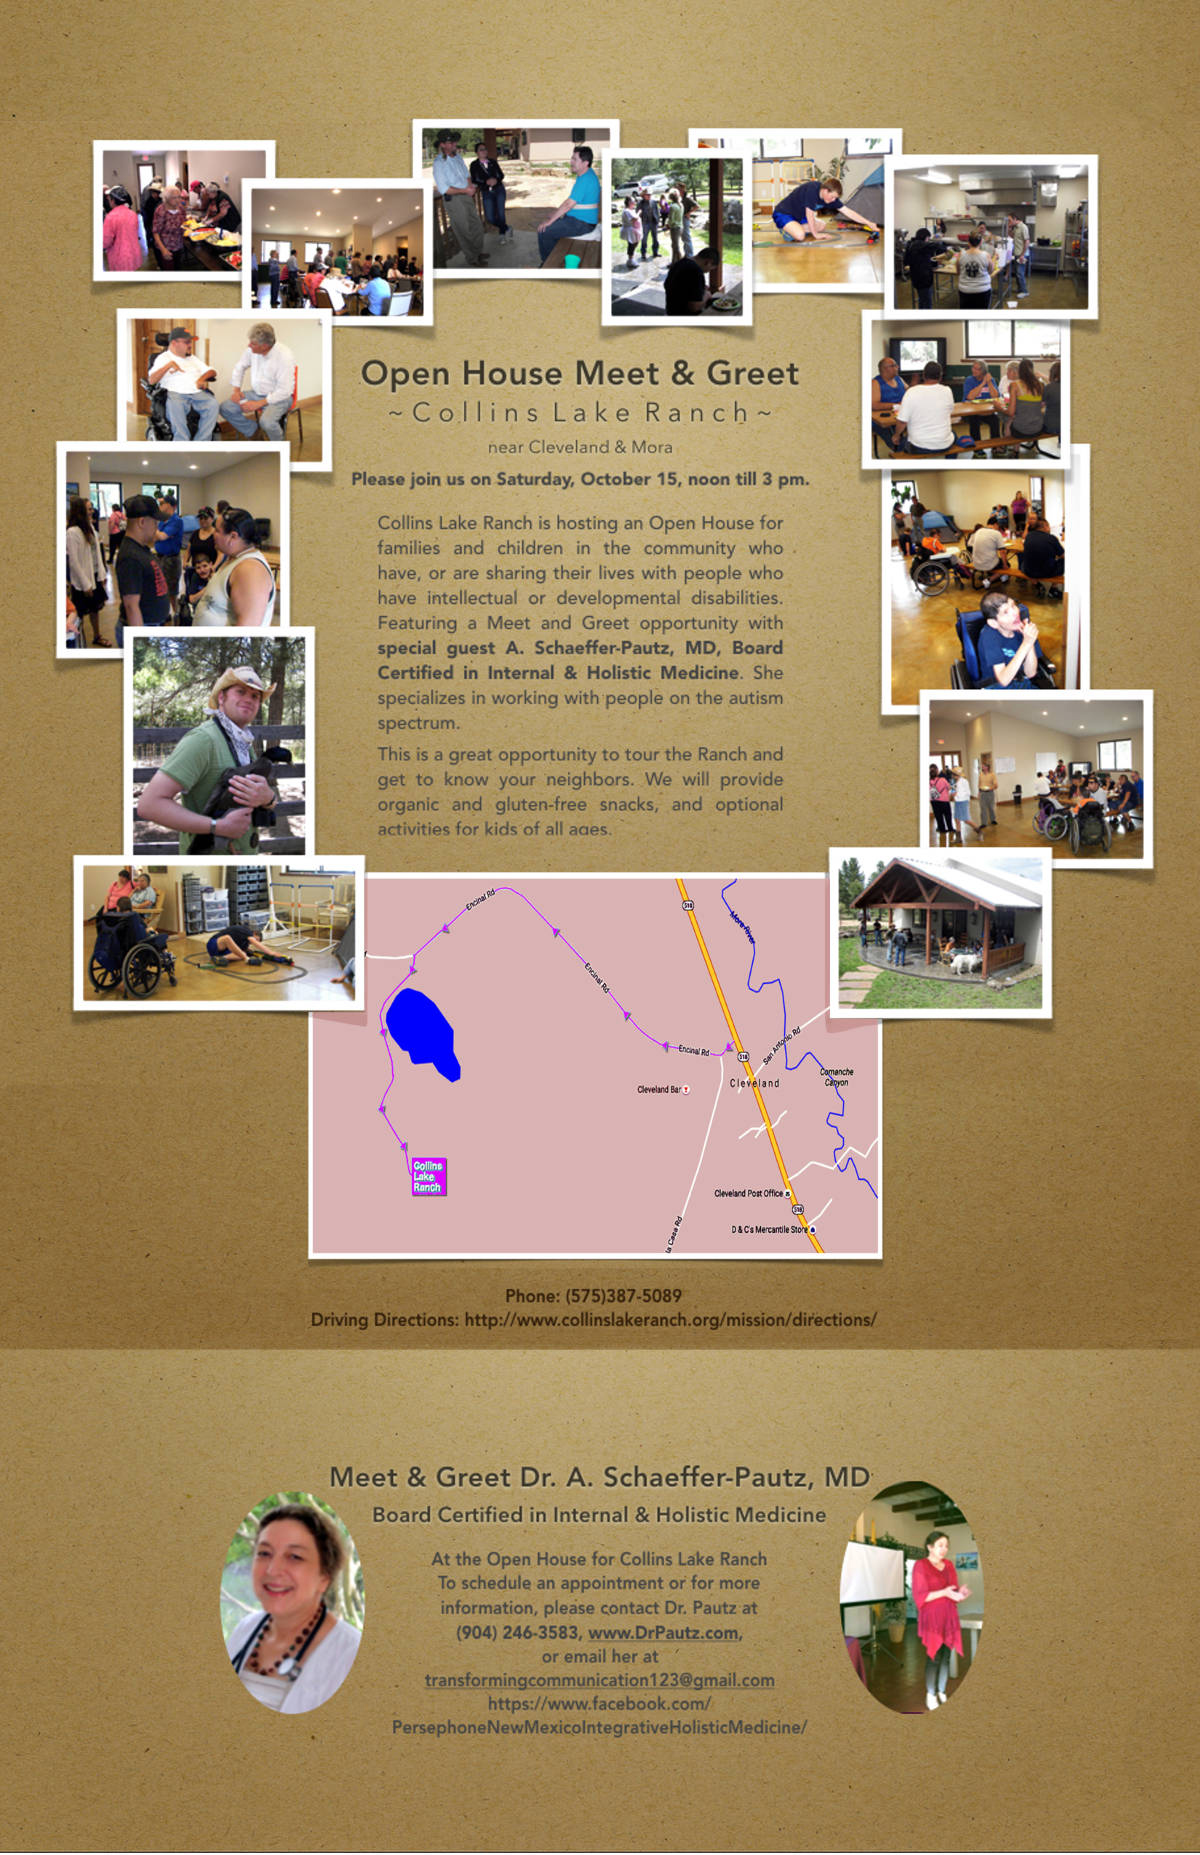 Dr. Pautz Collins Lake Ranch Open House Meet & Greet October 2016